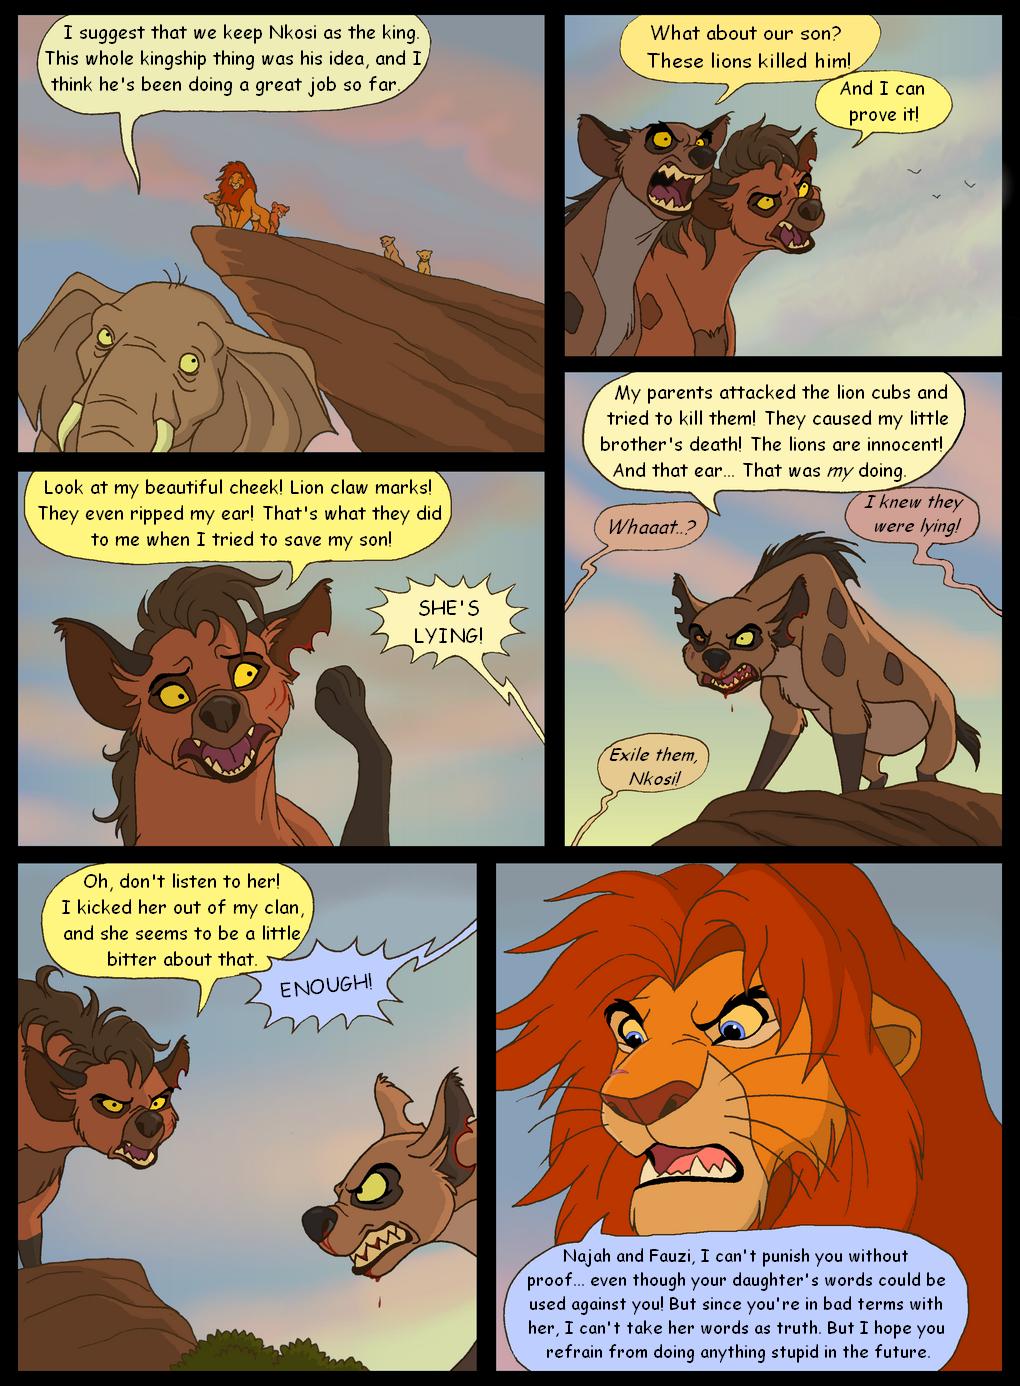 Pin By Brendabanegas On Der Konig Der Lowen 1 2 Lion King Drawings Lion King Art Lion King Story